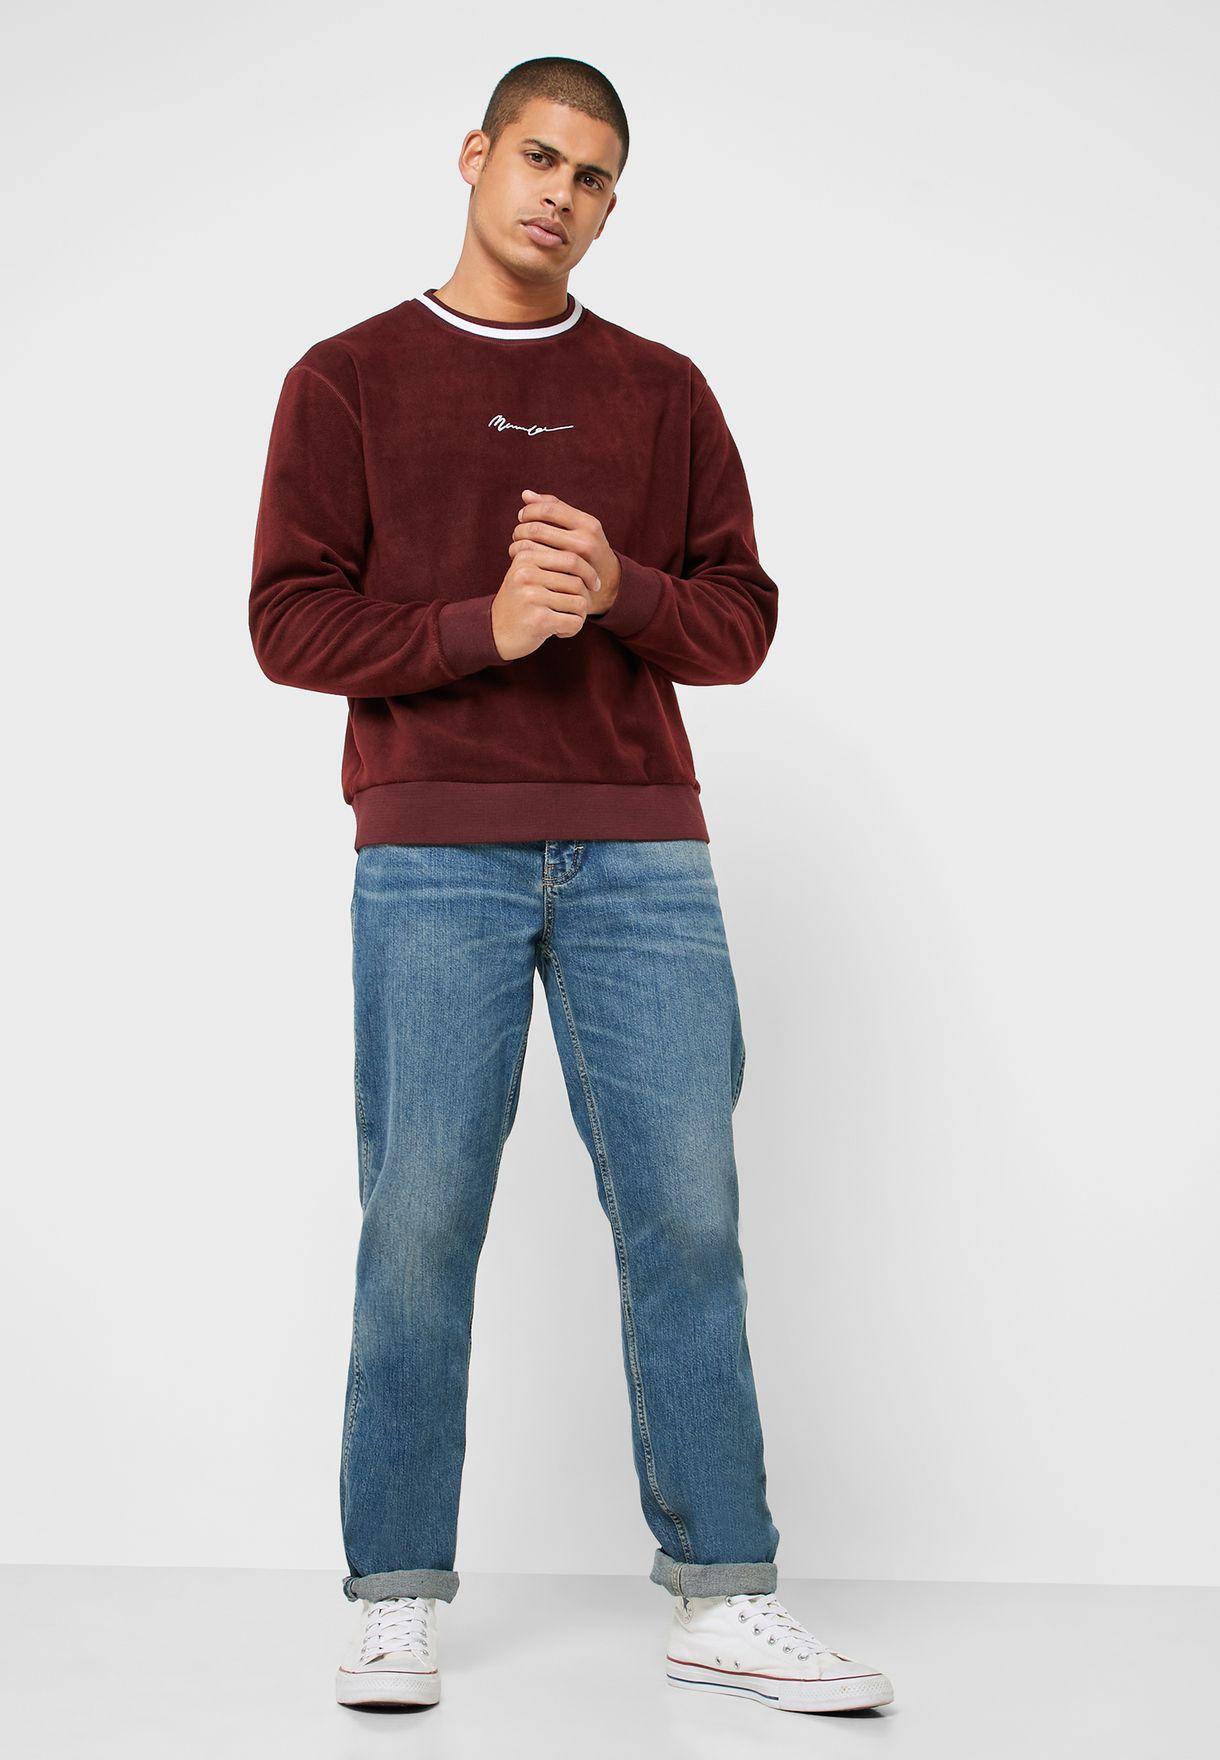 Polar Fleece Sweatshirt